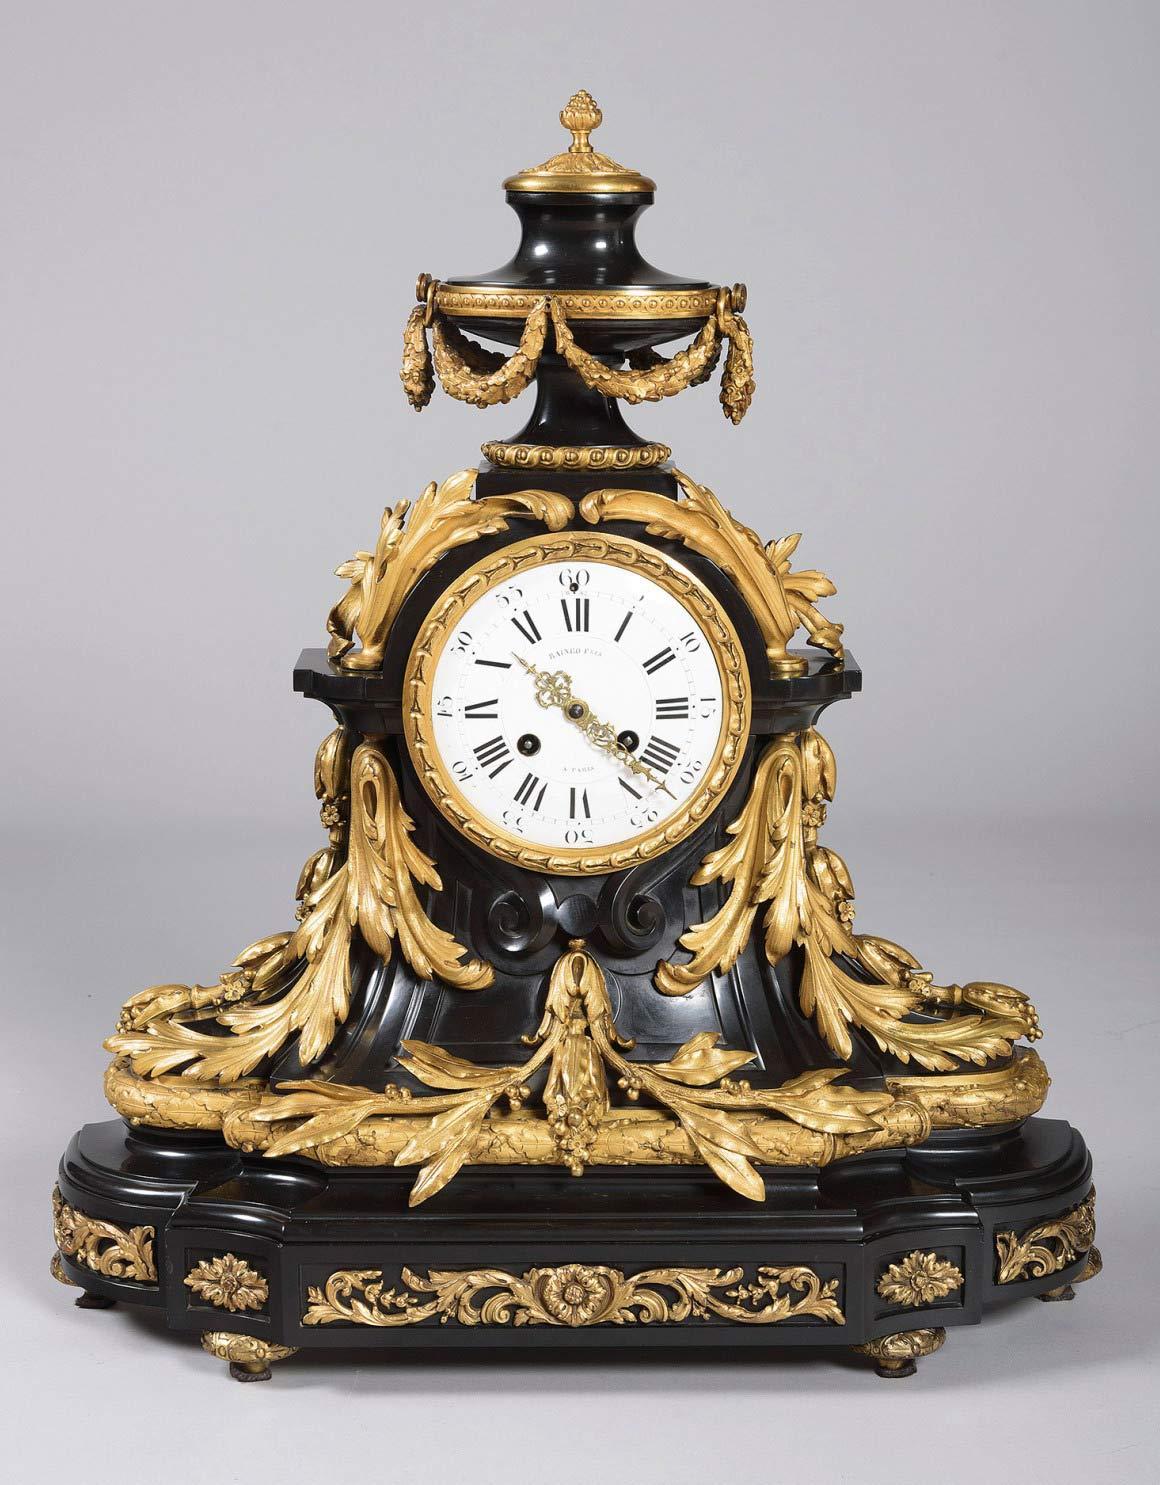 1004-reloj-de-sobremesa-estilo-luis-xvi-finales-sxix.00